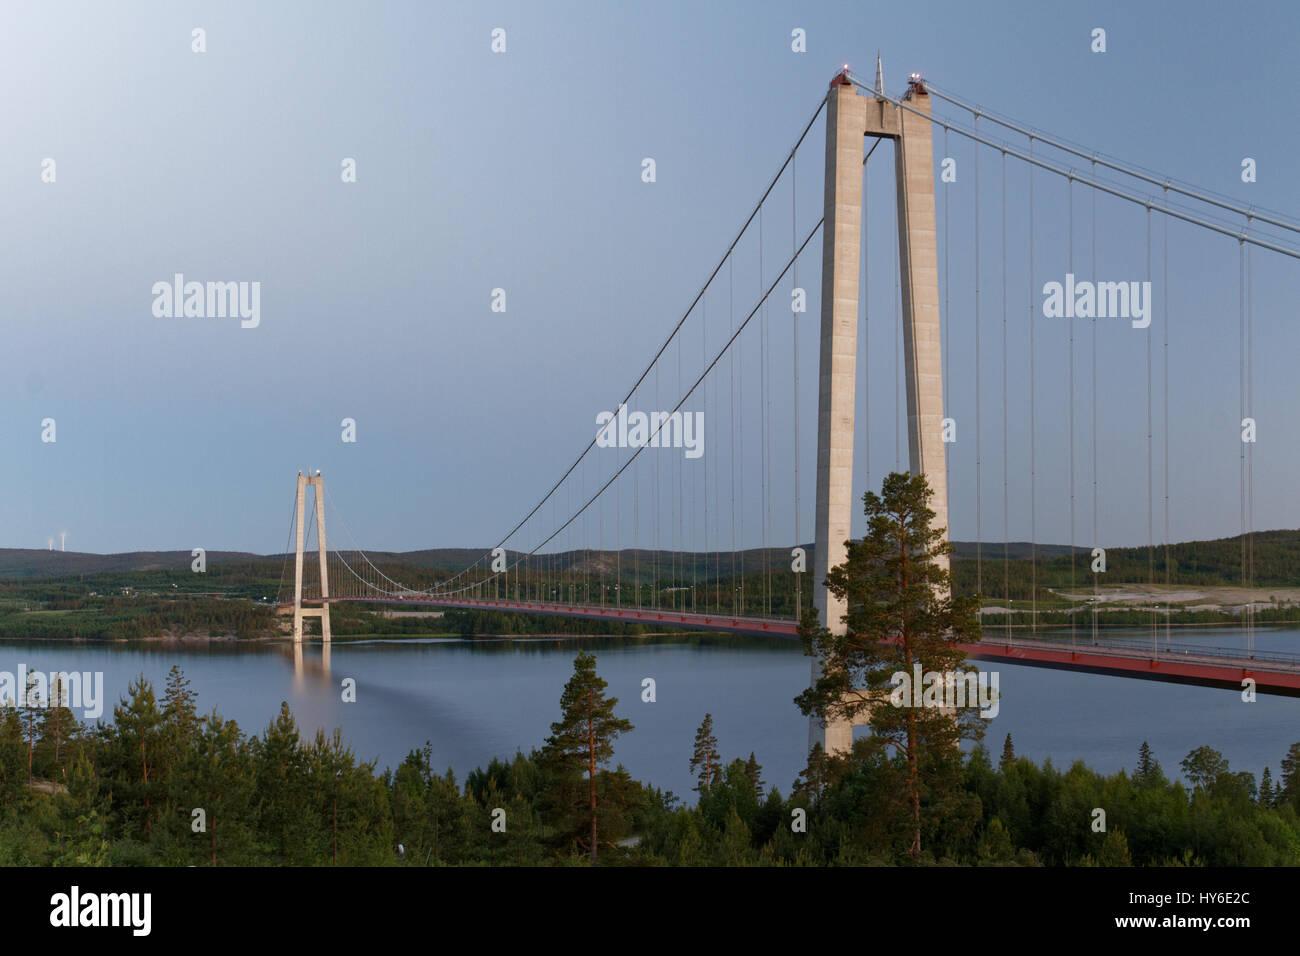 Bridge in Höga Kusten, Sweden - Stock Image